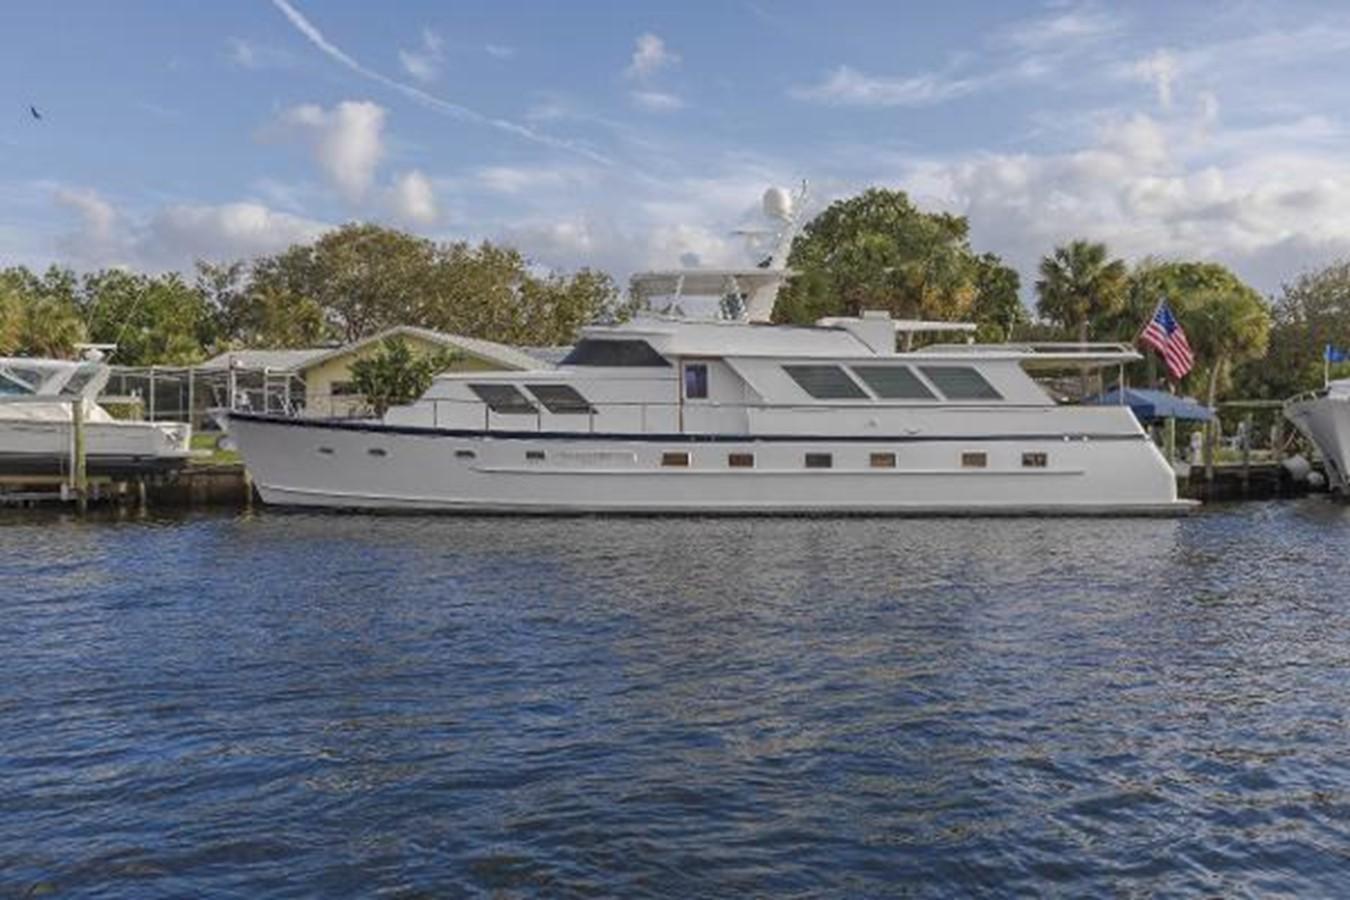 1982 BROWARD Raised Pilothouse Motor Yacht For Sale